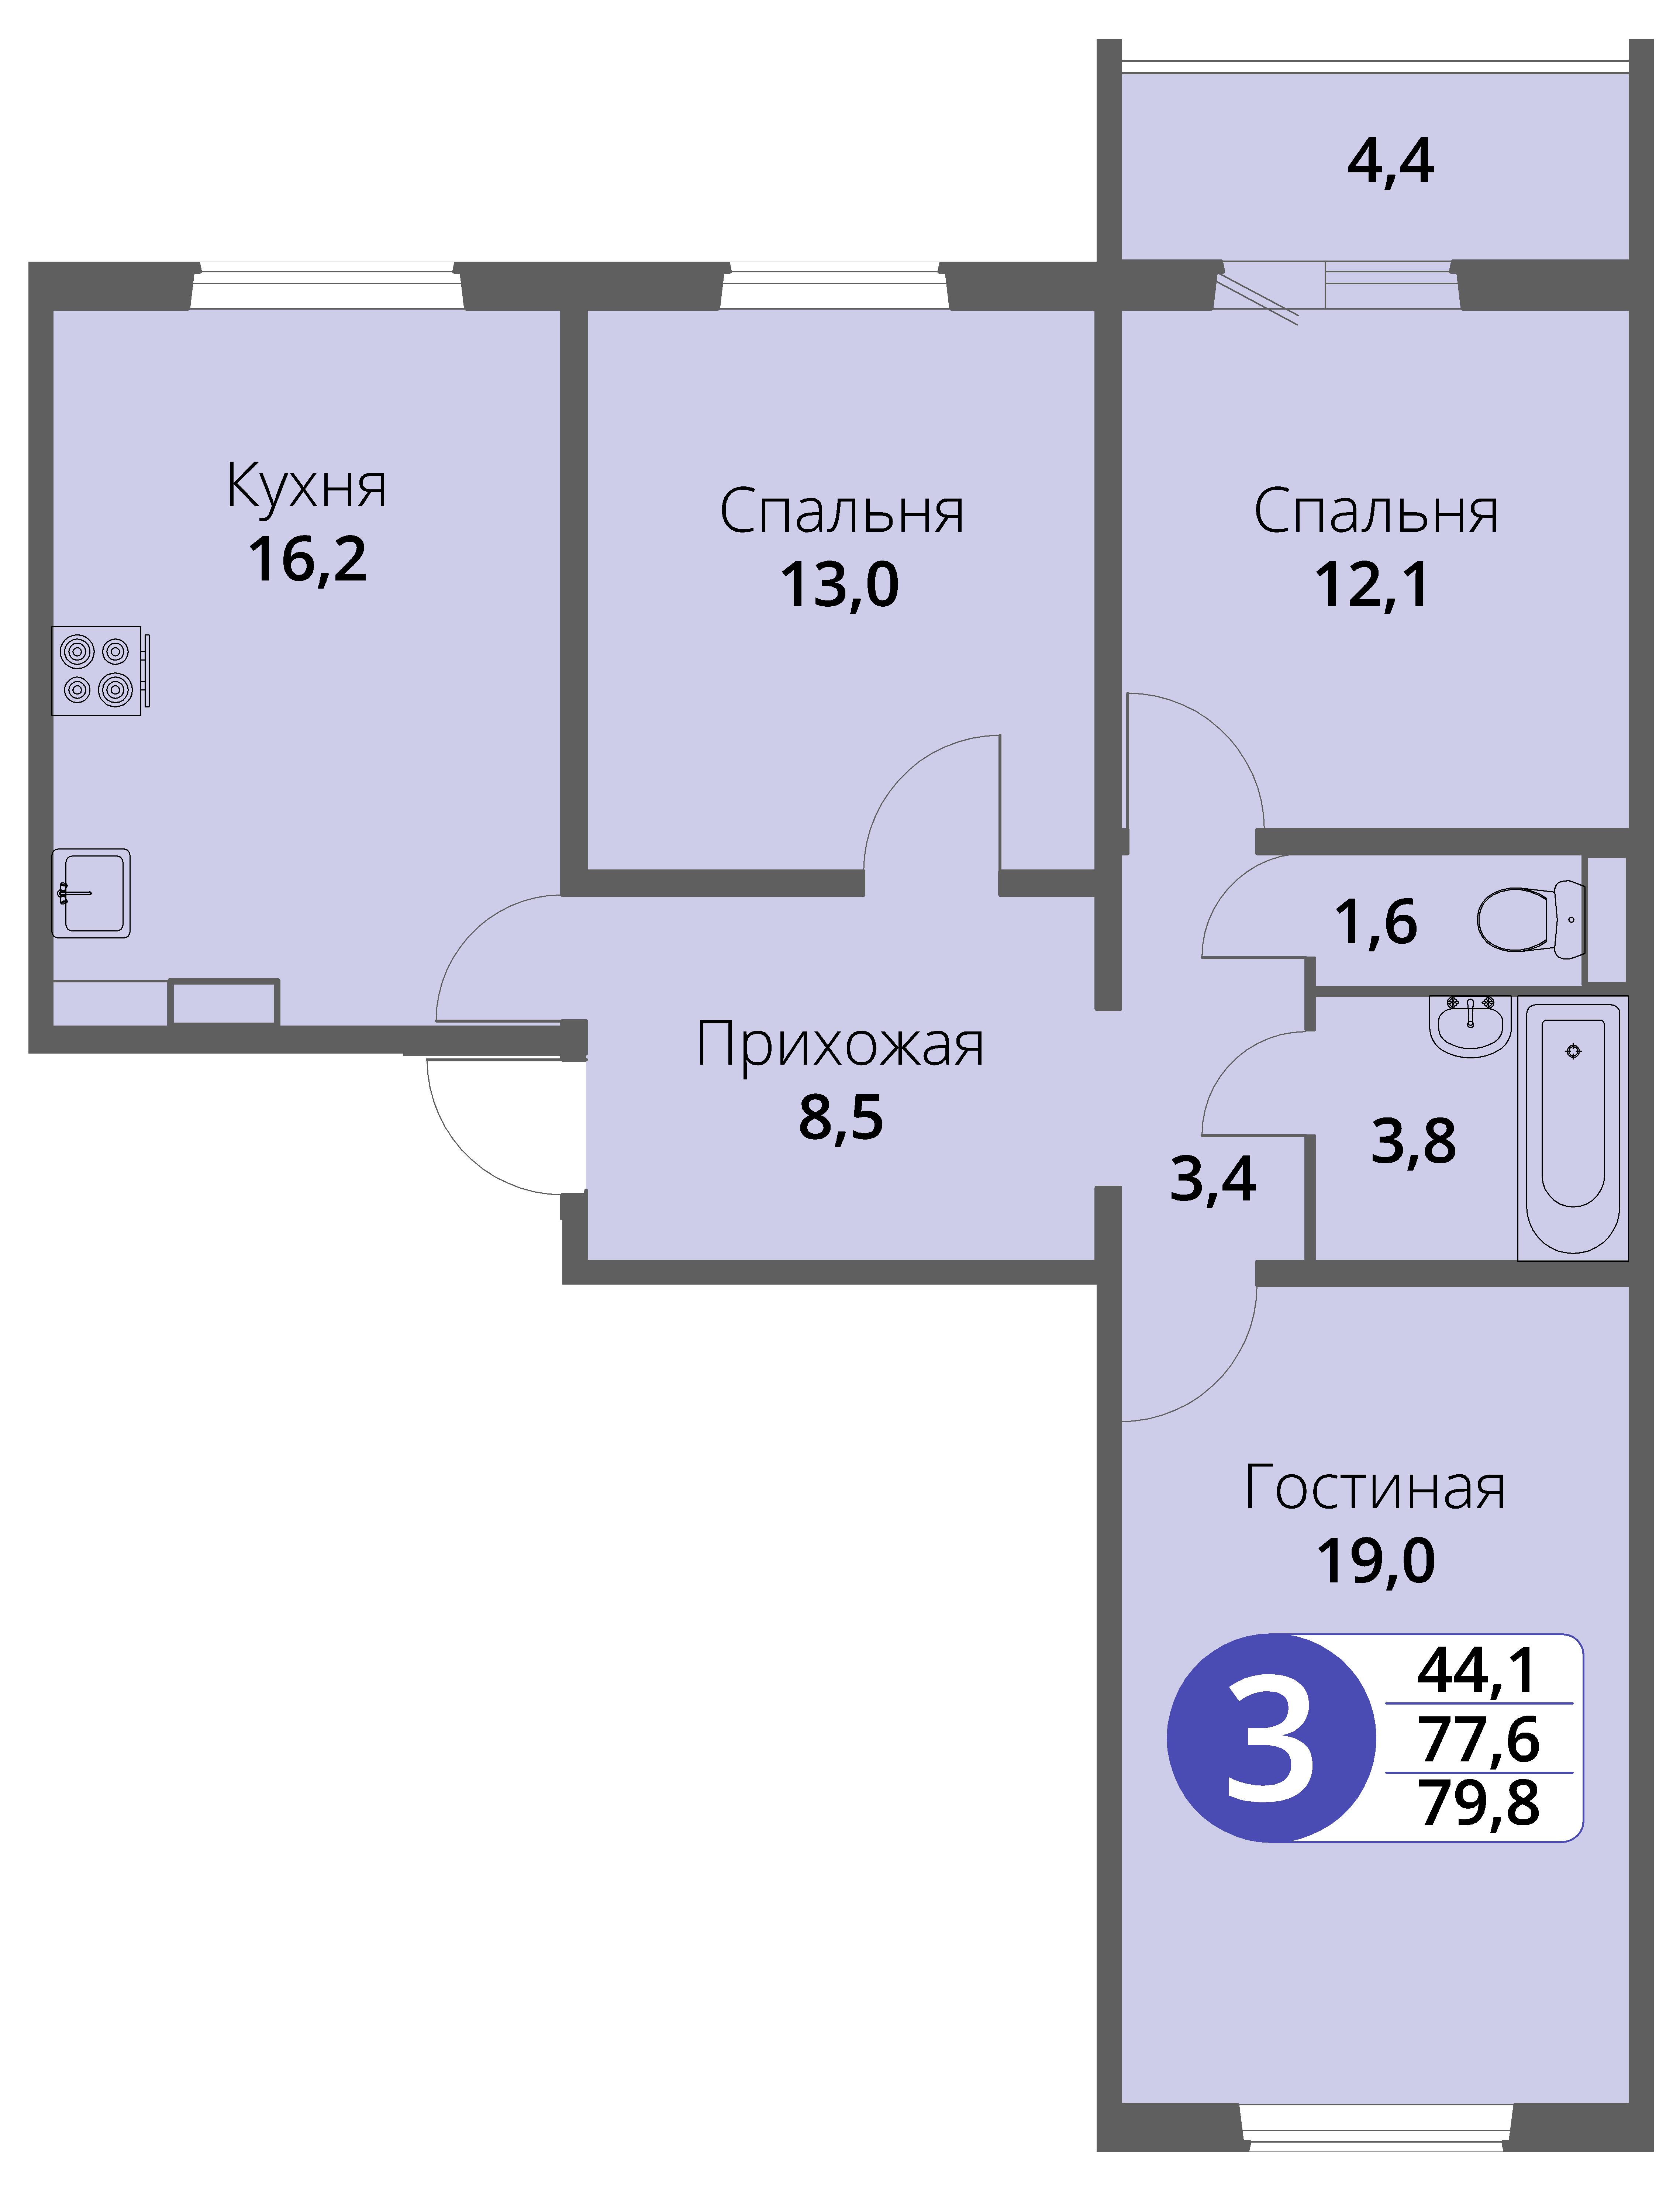 Зареченская 1-2, квартира 105 - Трехкомнатная